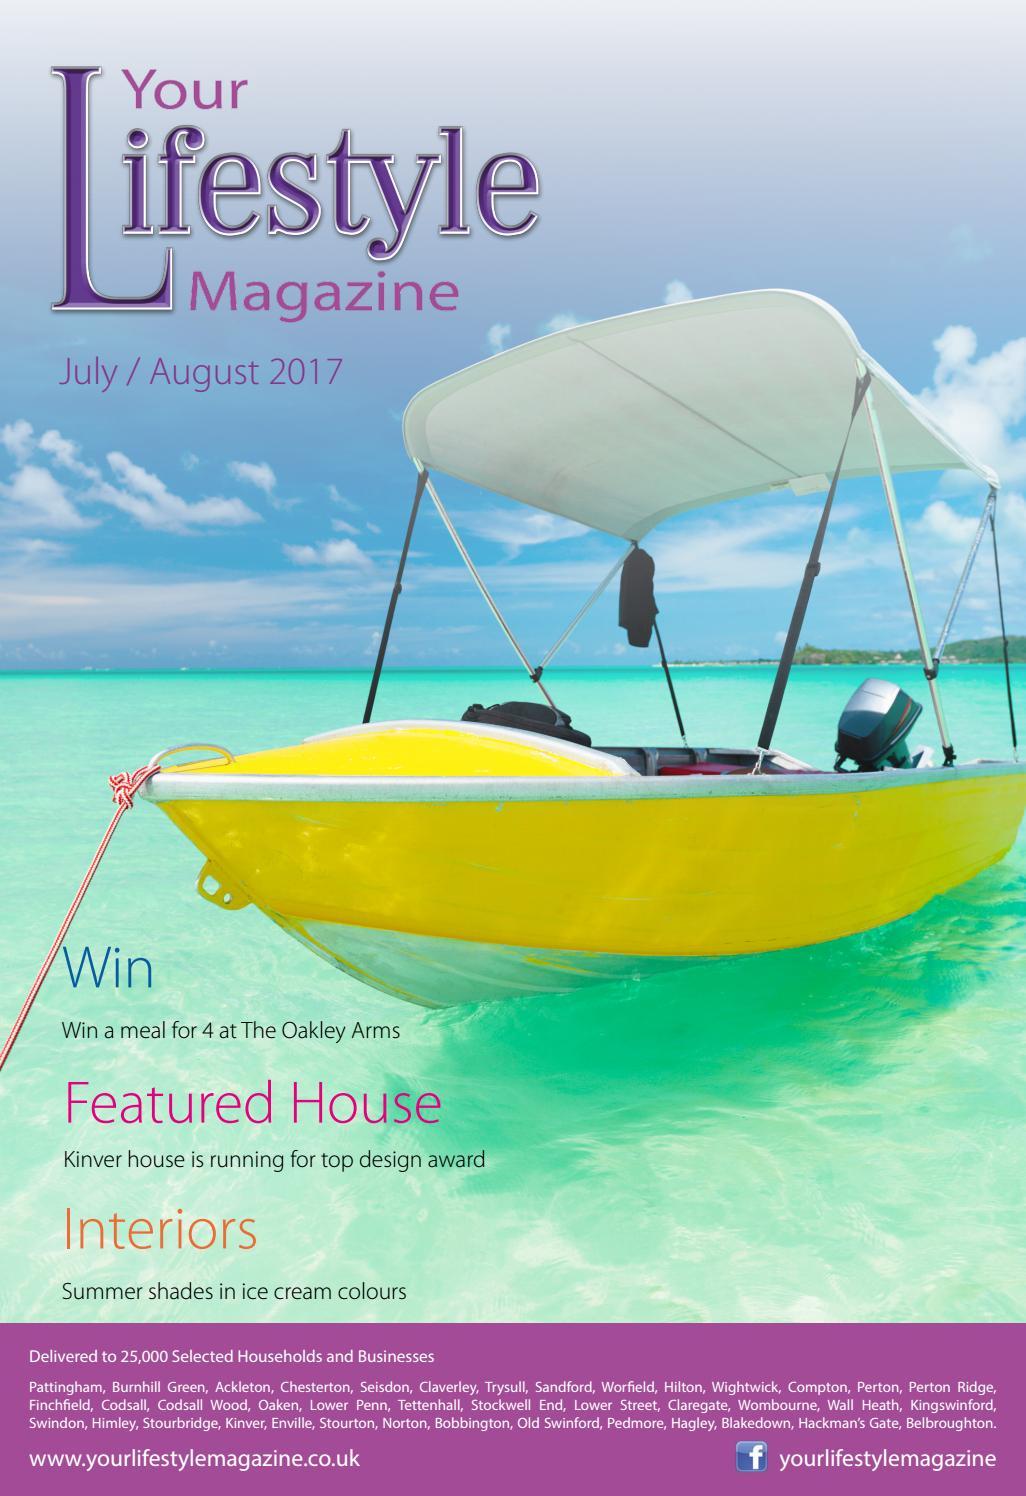 Your Lifestyle Magazine Jul/Aug 17 by Linda Farren - issuu